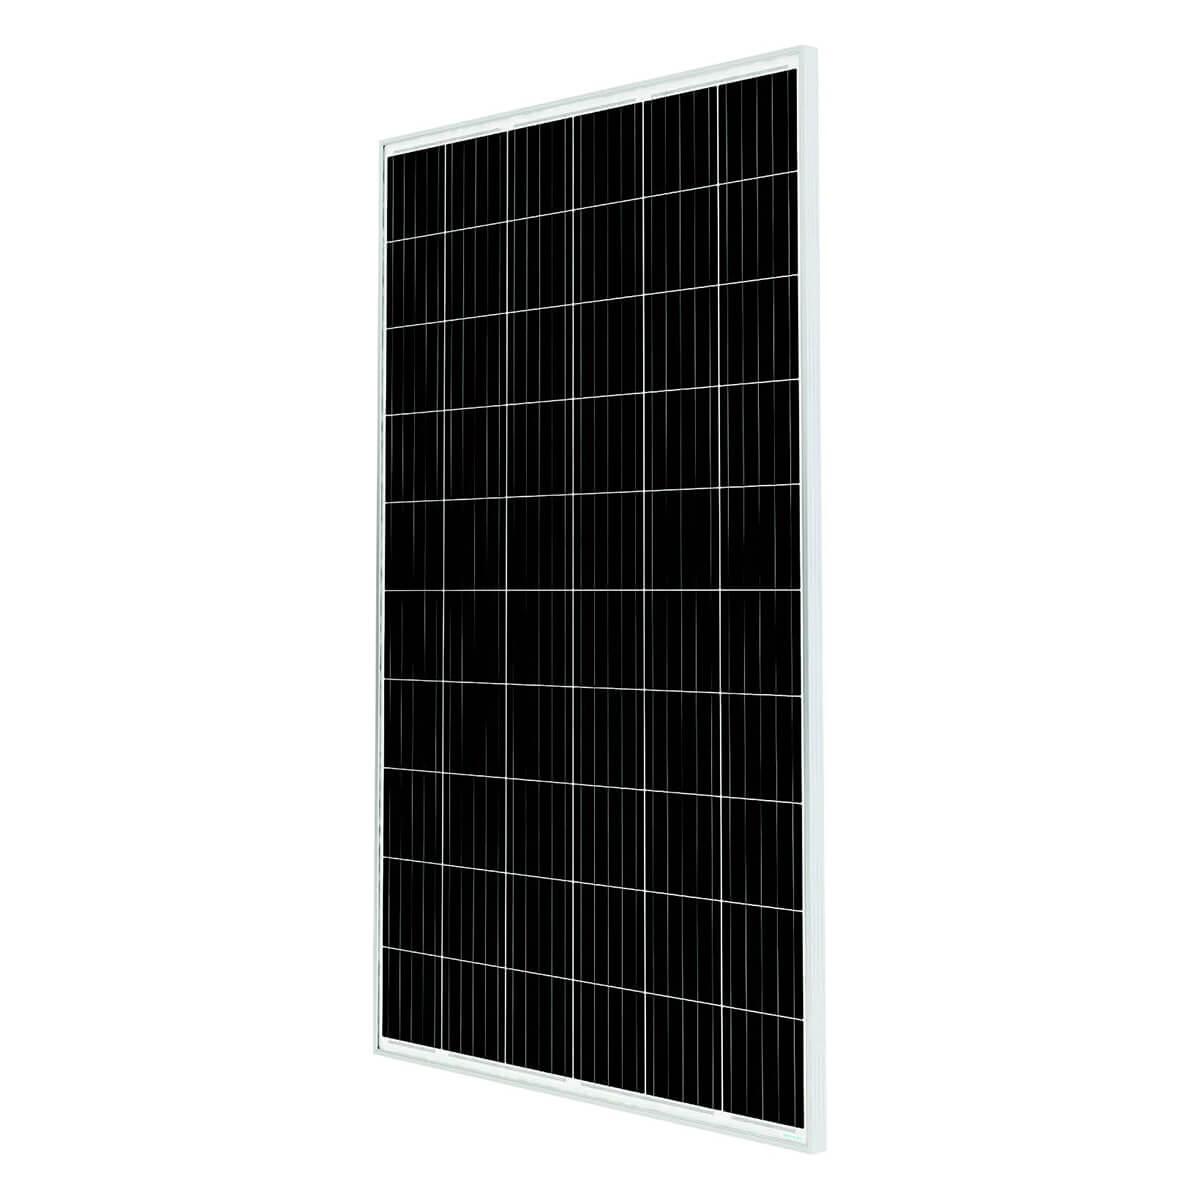 cw enerji 335W panel, cw enerji 335Watt panel, cw enerji 335 W panel, cw enerji 335 Watt panel, cw enerji 335 Watt monokristal panel, cw enerji 335 W watt gunes paneli, cw enerji 335 W watt monokristal gunes paneli, cw enerji 335 W Watt fotovoltaik monokristal solar panel, cw enerji 335W monokristal gunes enerjisi, cw enerji CWT335-60PM-335 panel, CW Enerji 335 WATT